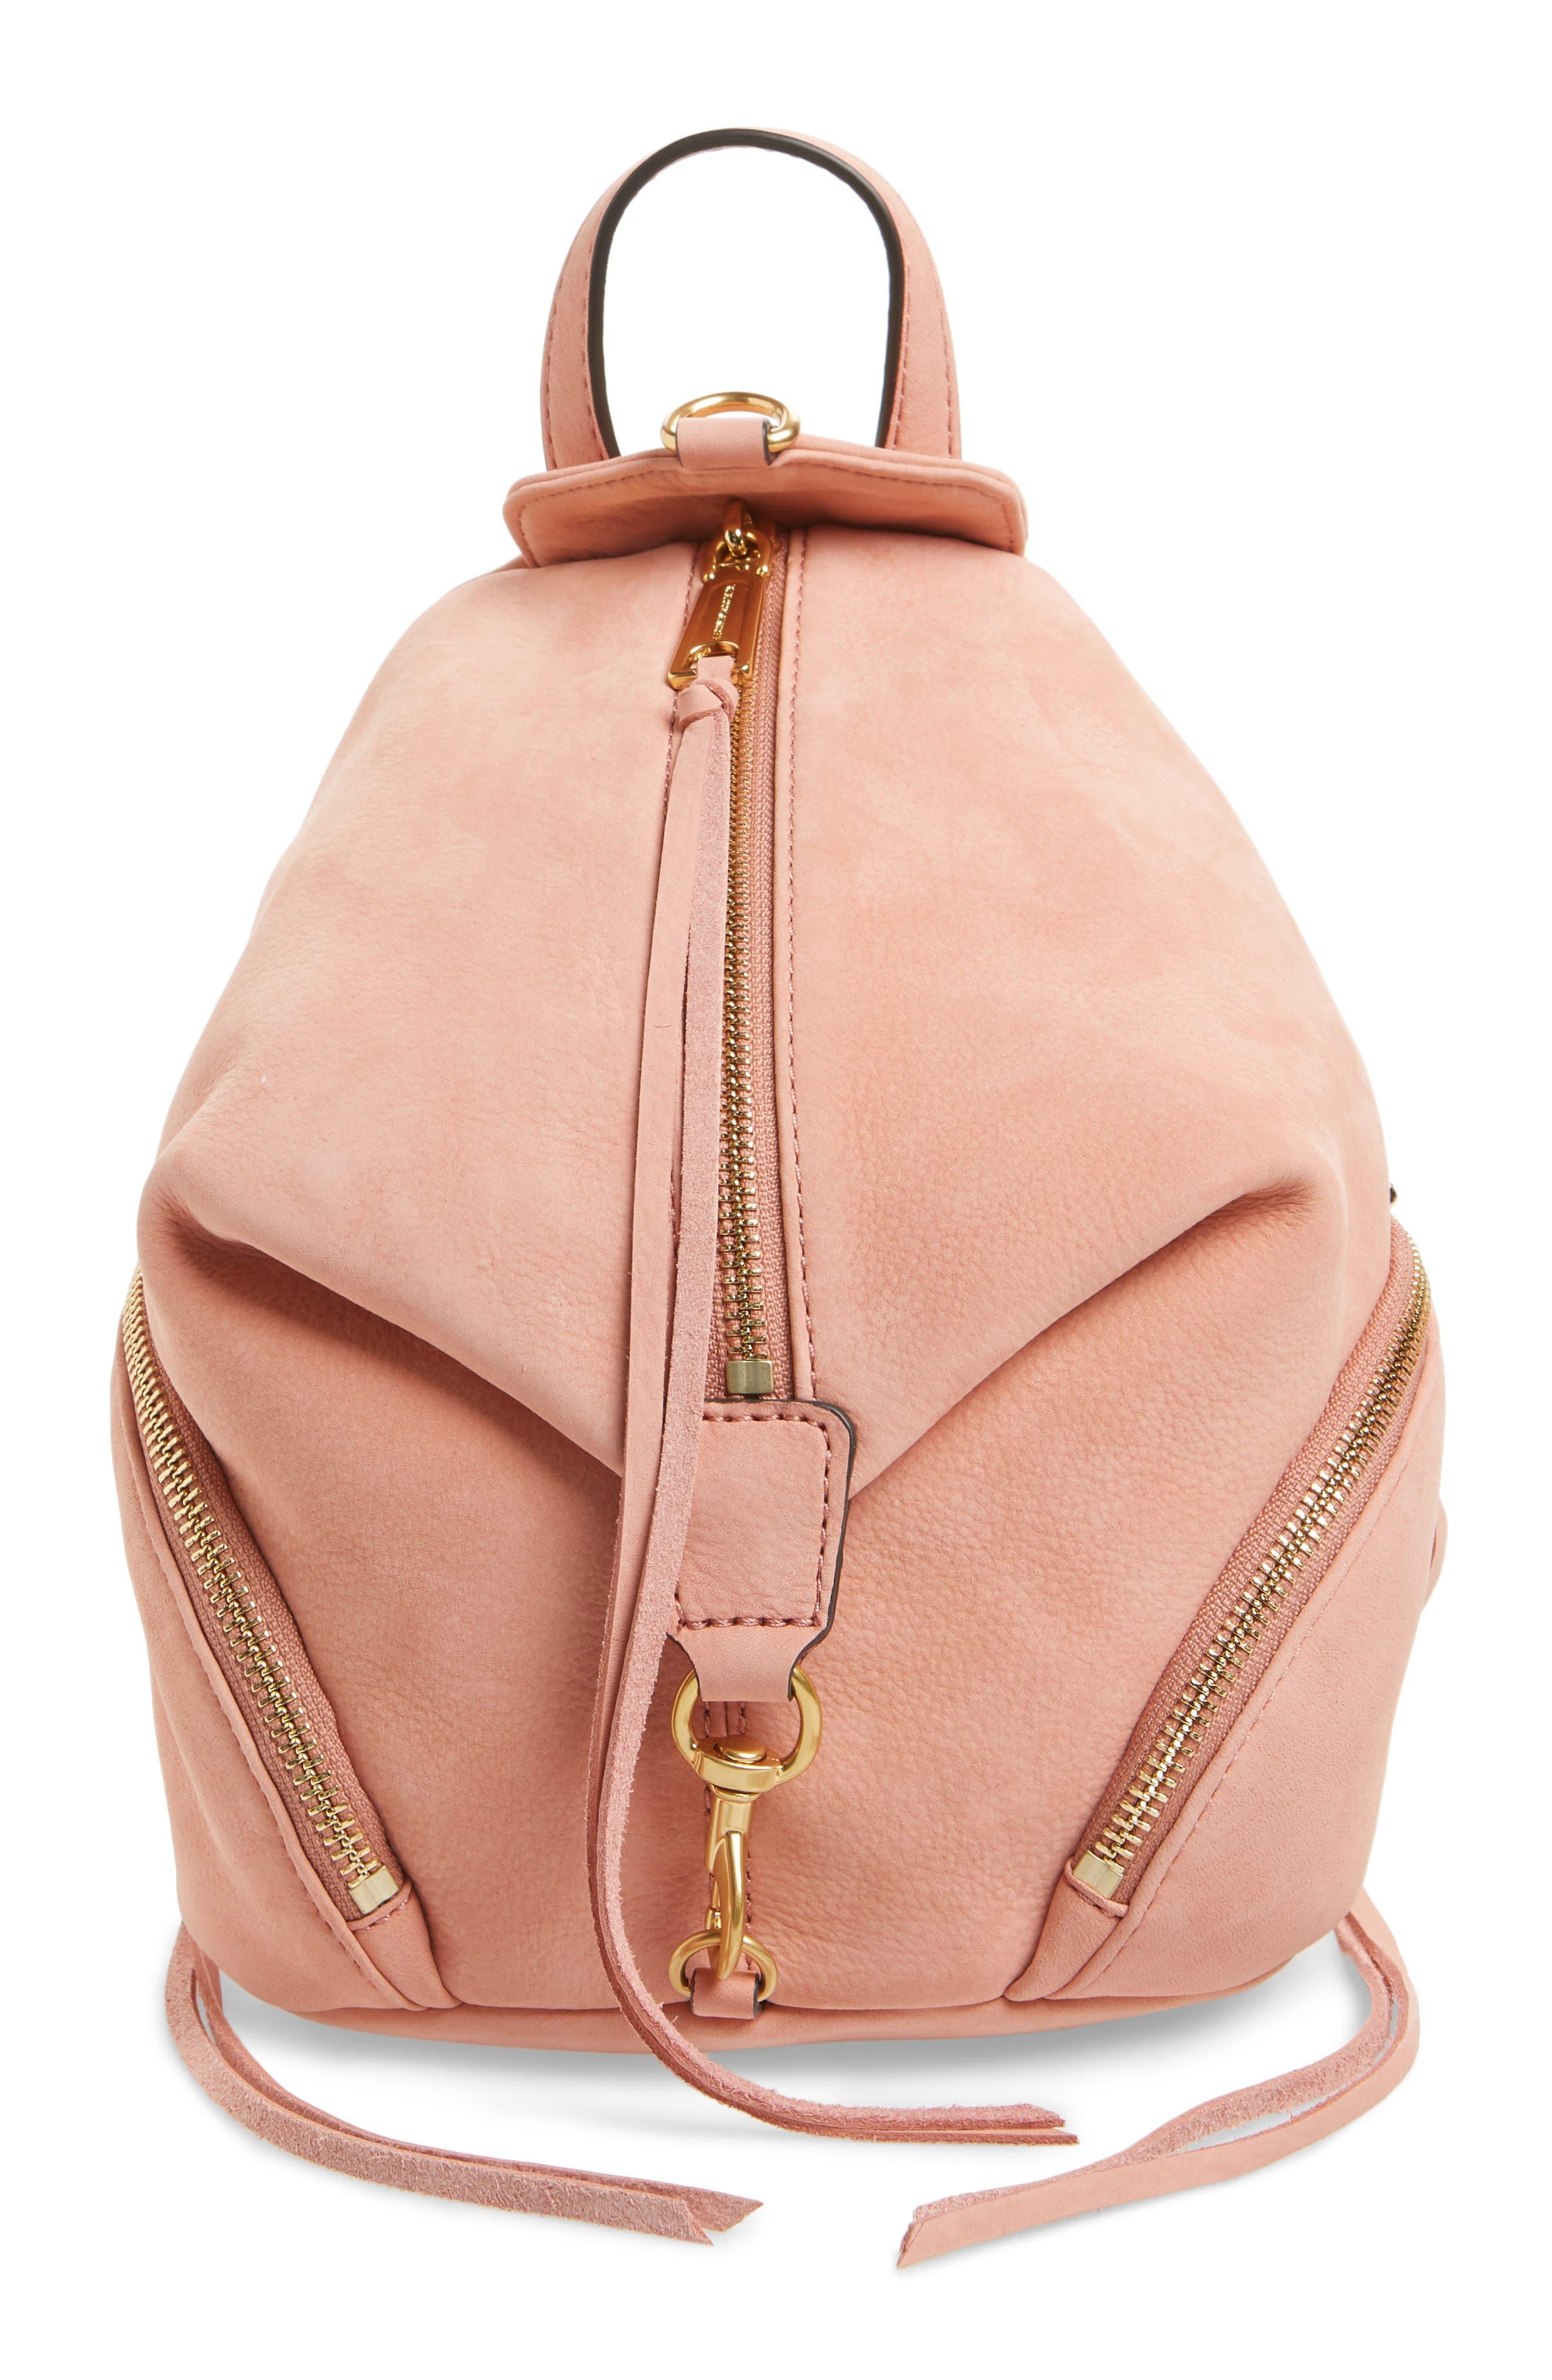 Mini Julian Nubuck Leather Convertible Backpack,                             Main thumbnail 1, color,                             DUSTY PEACH